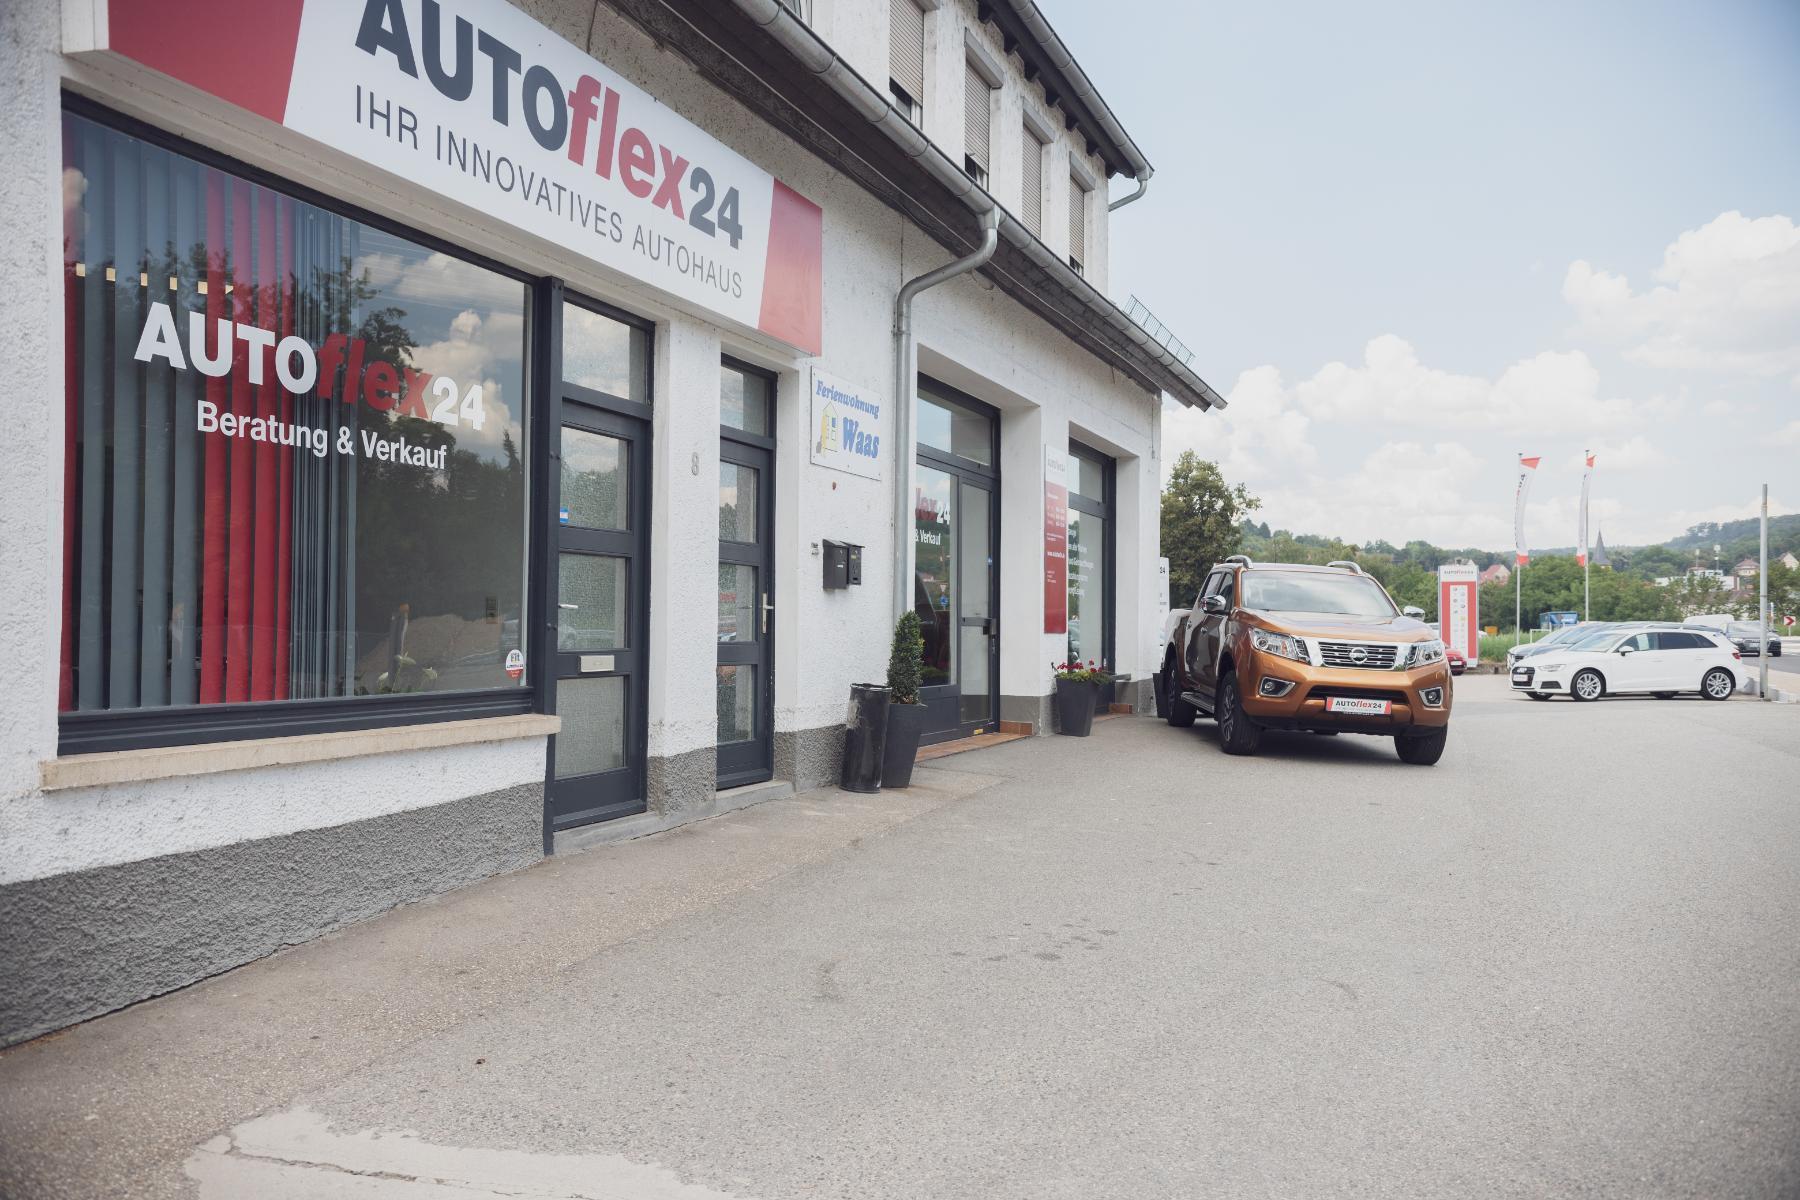 eu neuwagen gundelsheim autohaus autoflex24. Black Bedroom Furniture Sets. Home Design Ideas